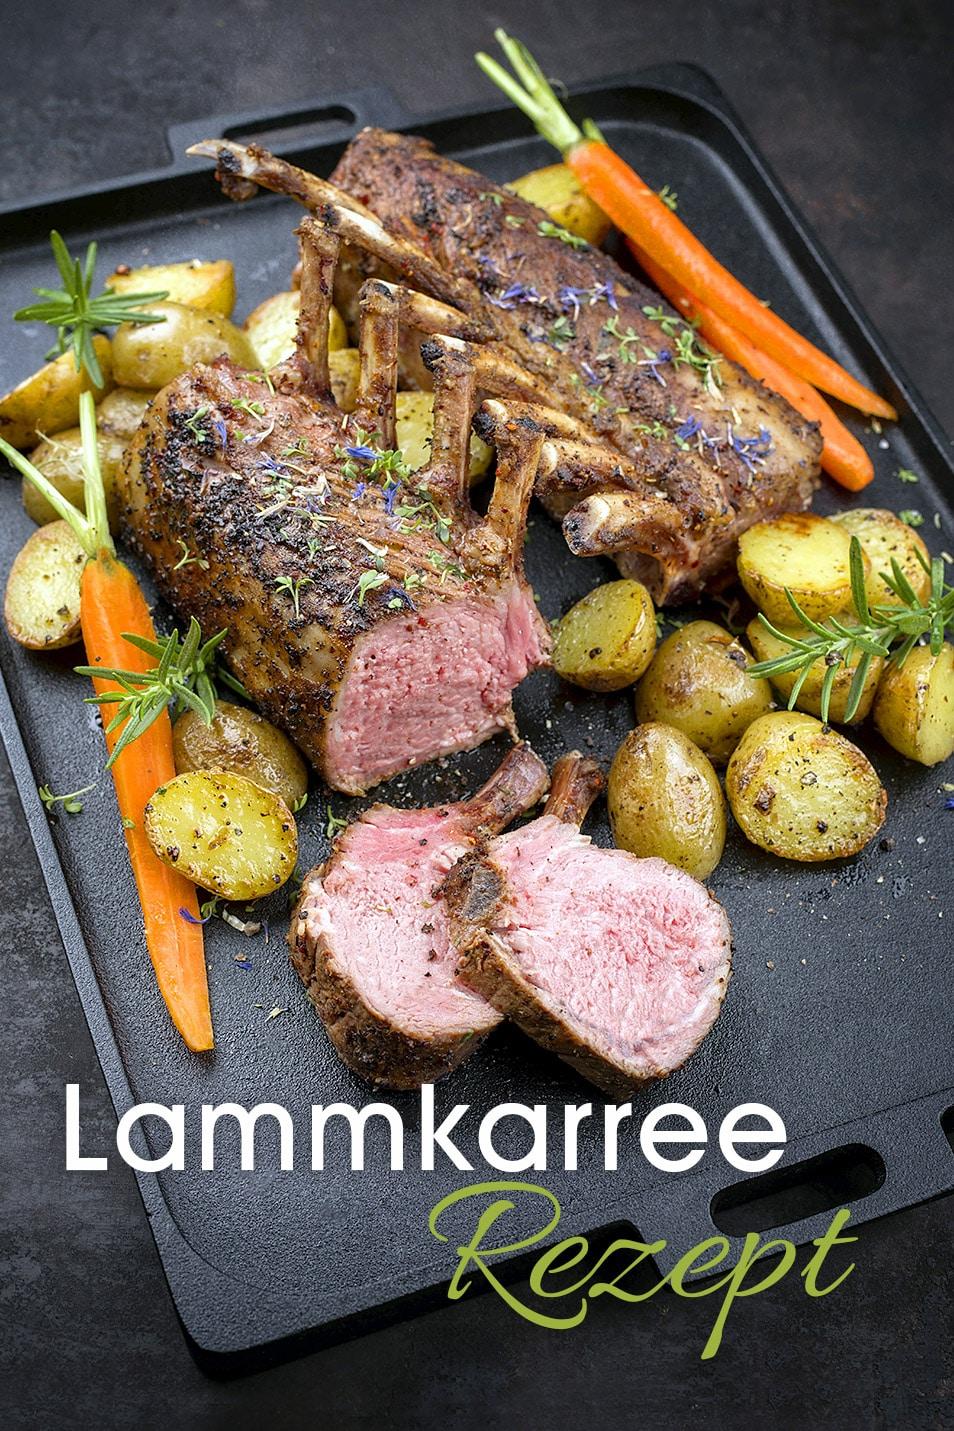 Lammkarree Rezept Fruehling Genuss Relana Dombetzki ALDO Magazin